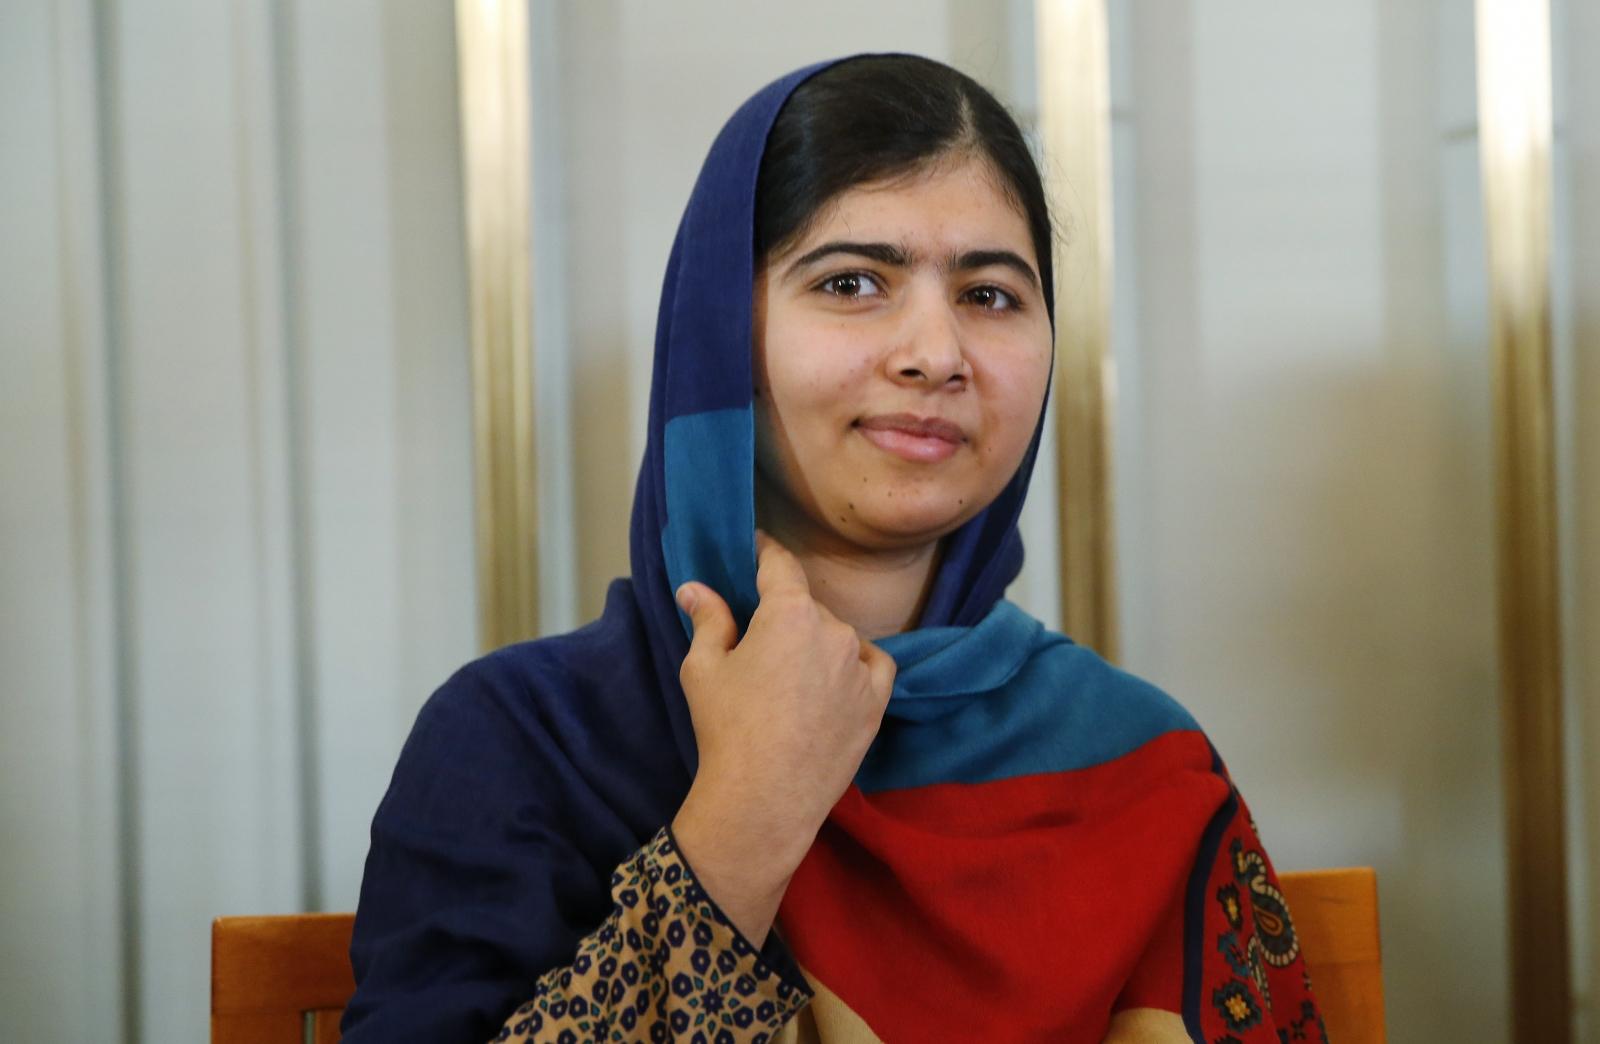 Nobel Peace Prize winner Malala Yousafzai revealed wish to be Pakistan Prime Minister